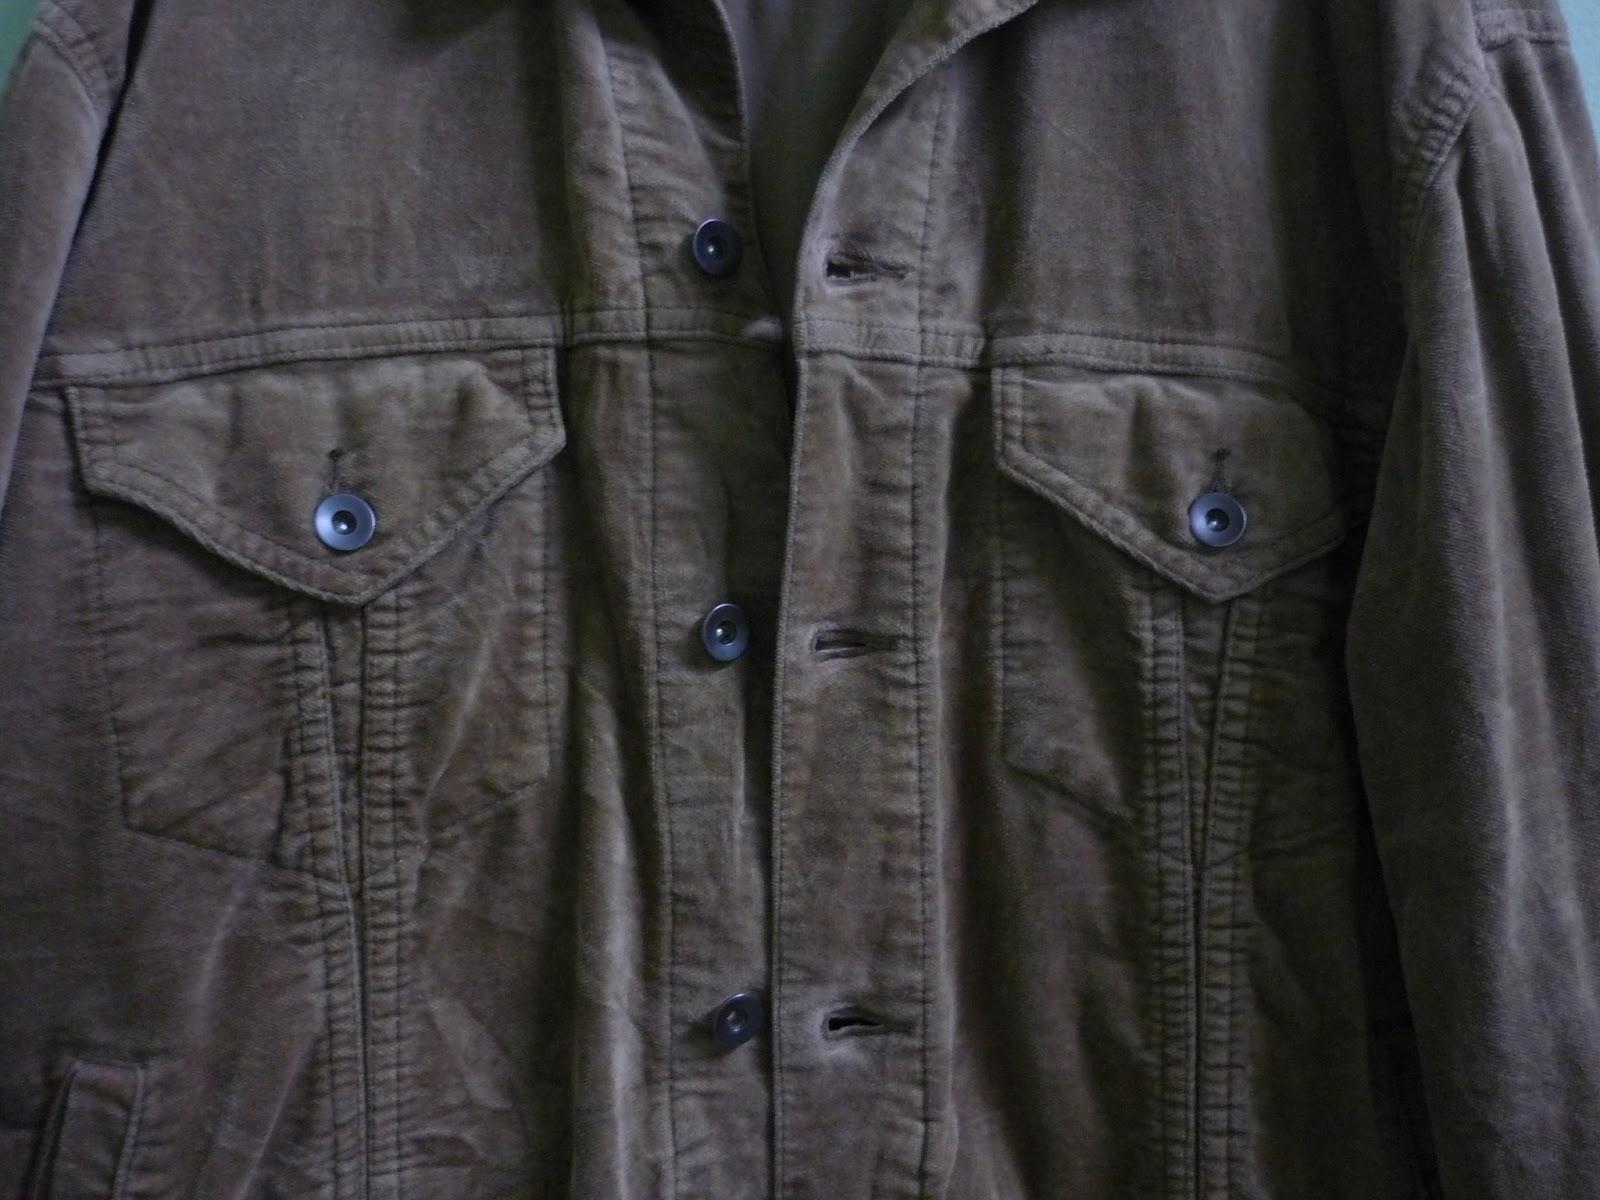 Clayback Bush Thrift Store Jacket Uniqlo Light Brown Corduroy Jaket Redbull Description Curduroy Color M Size